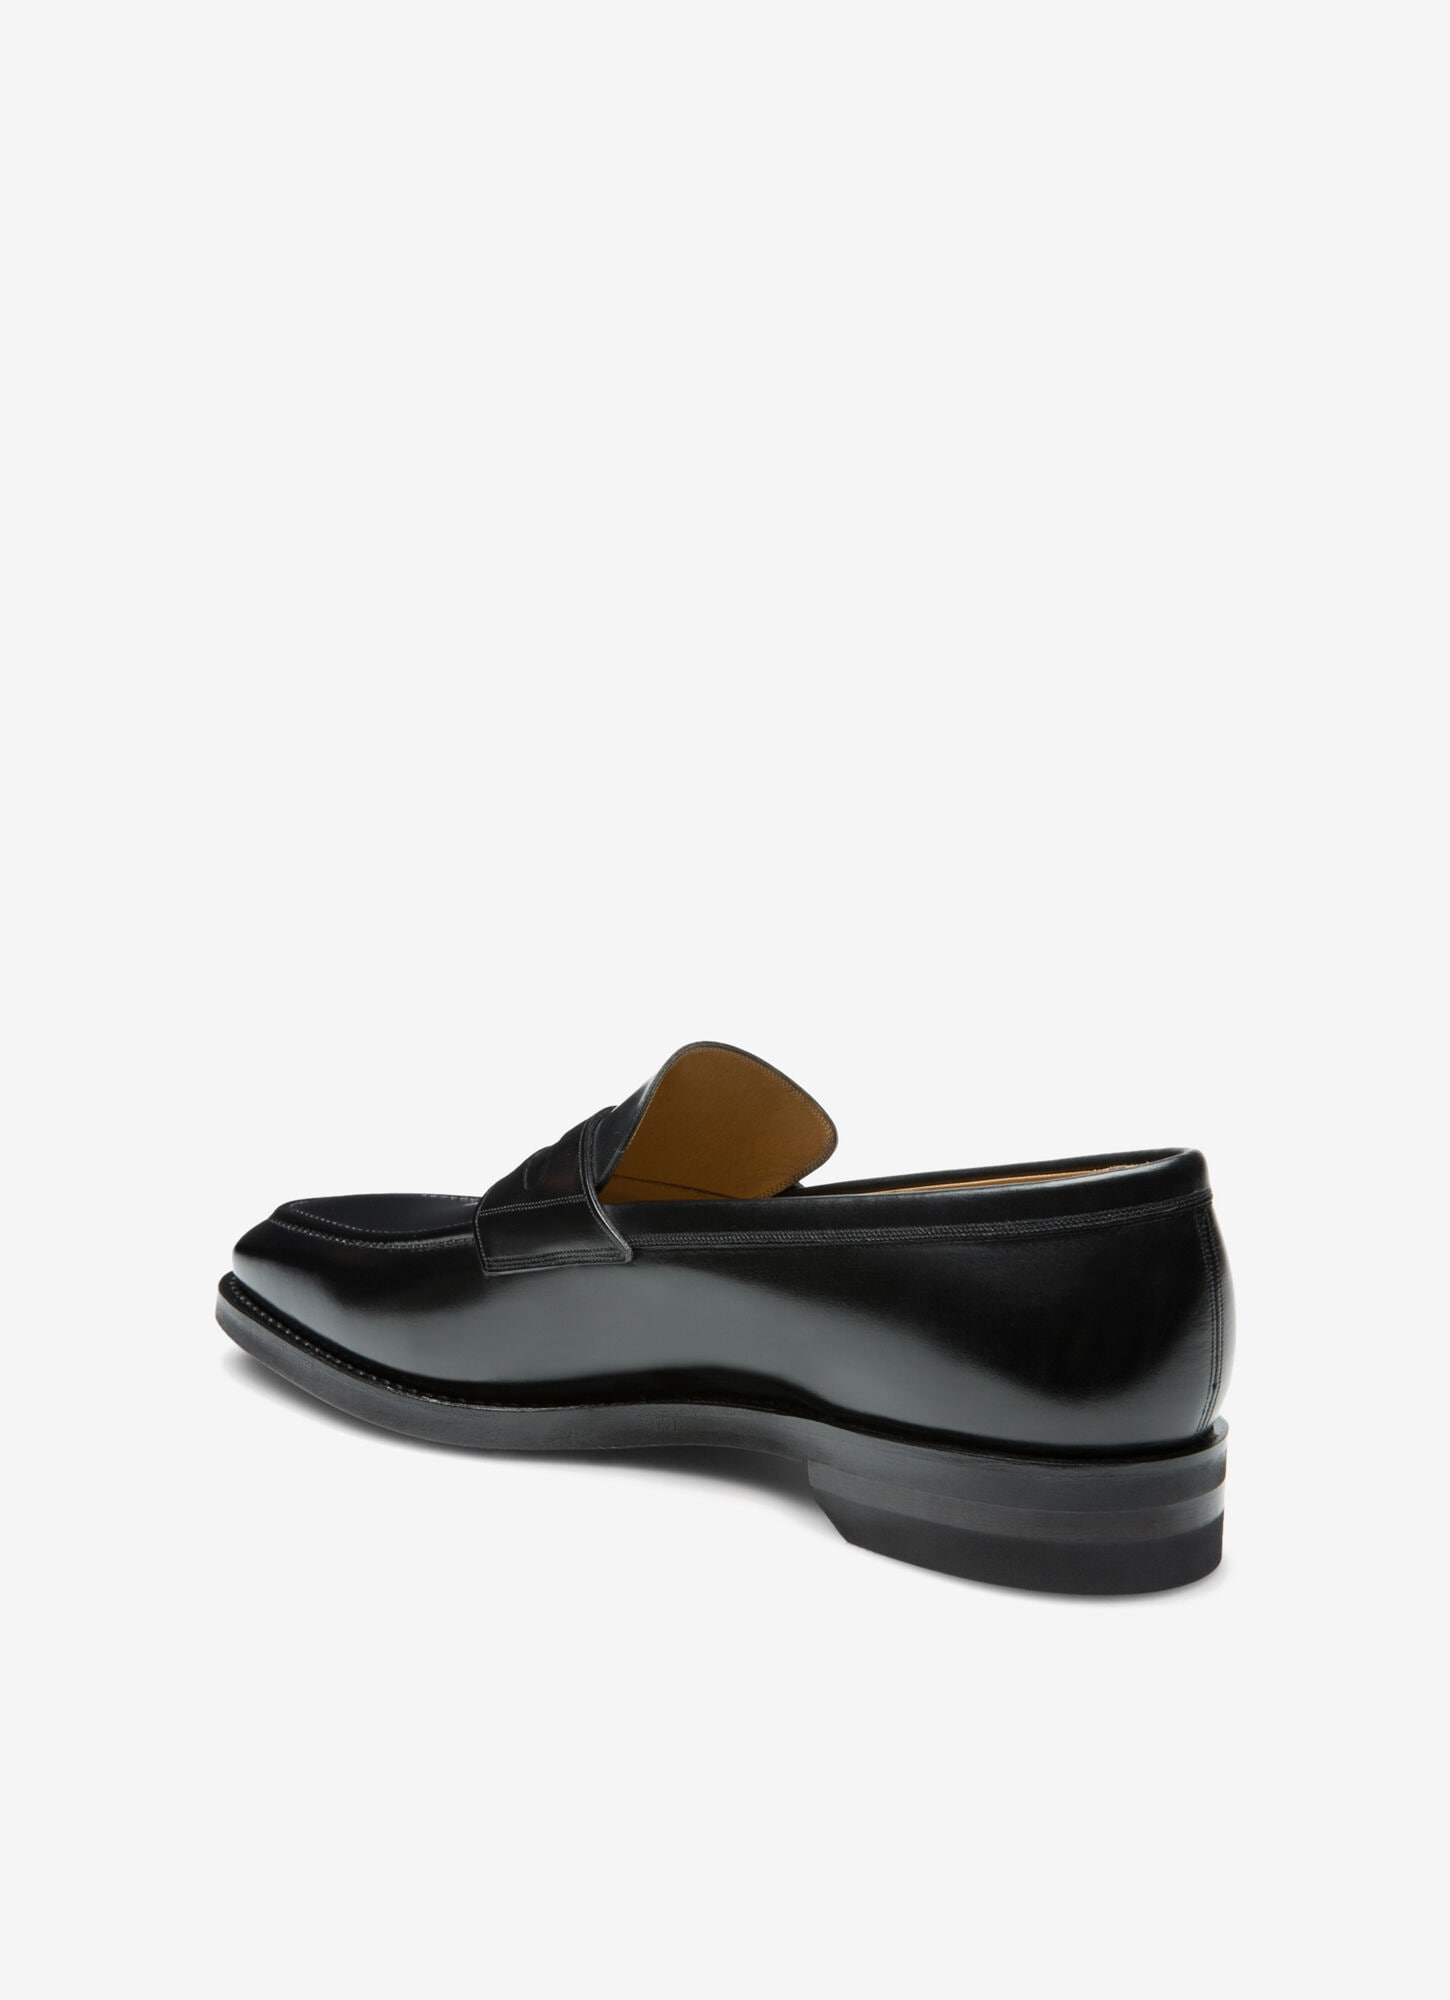 black loafer sneakers